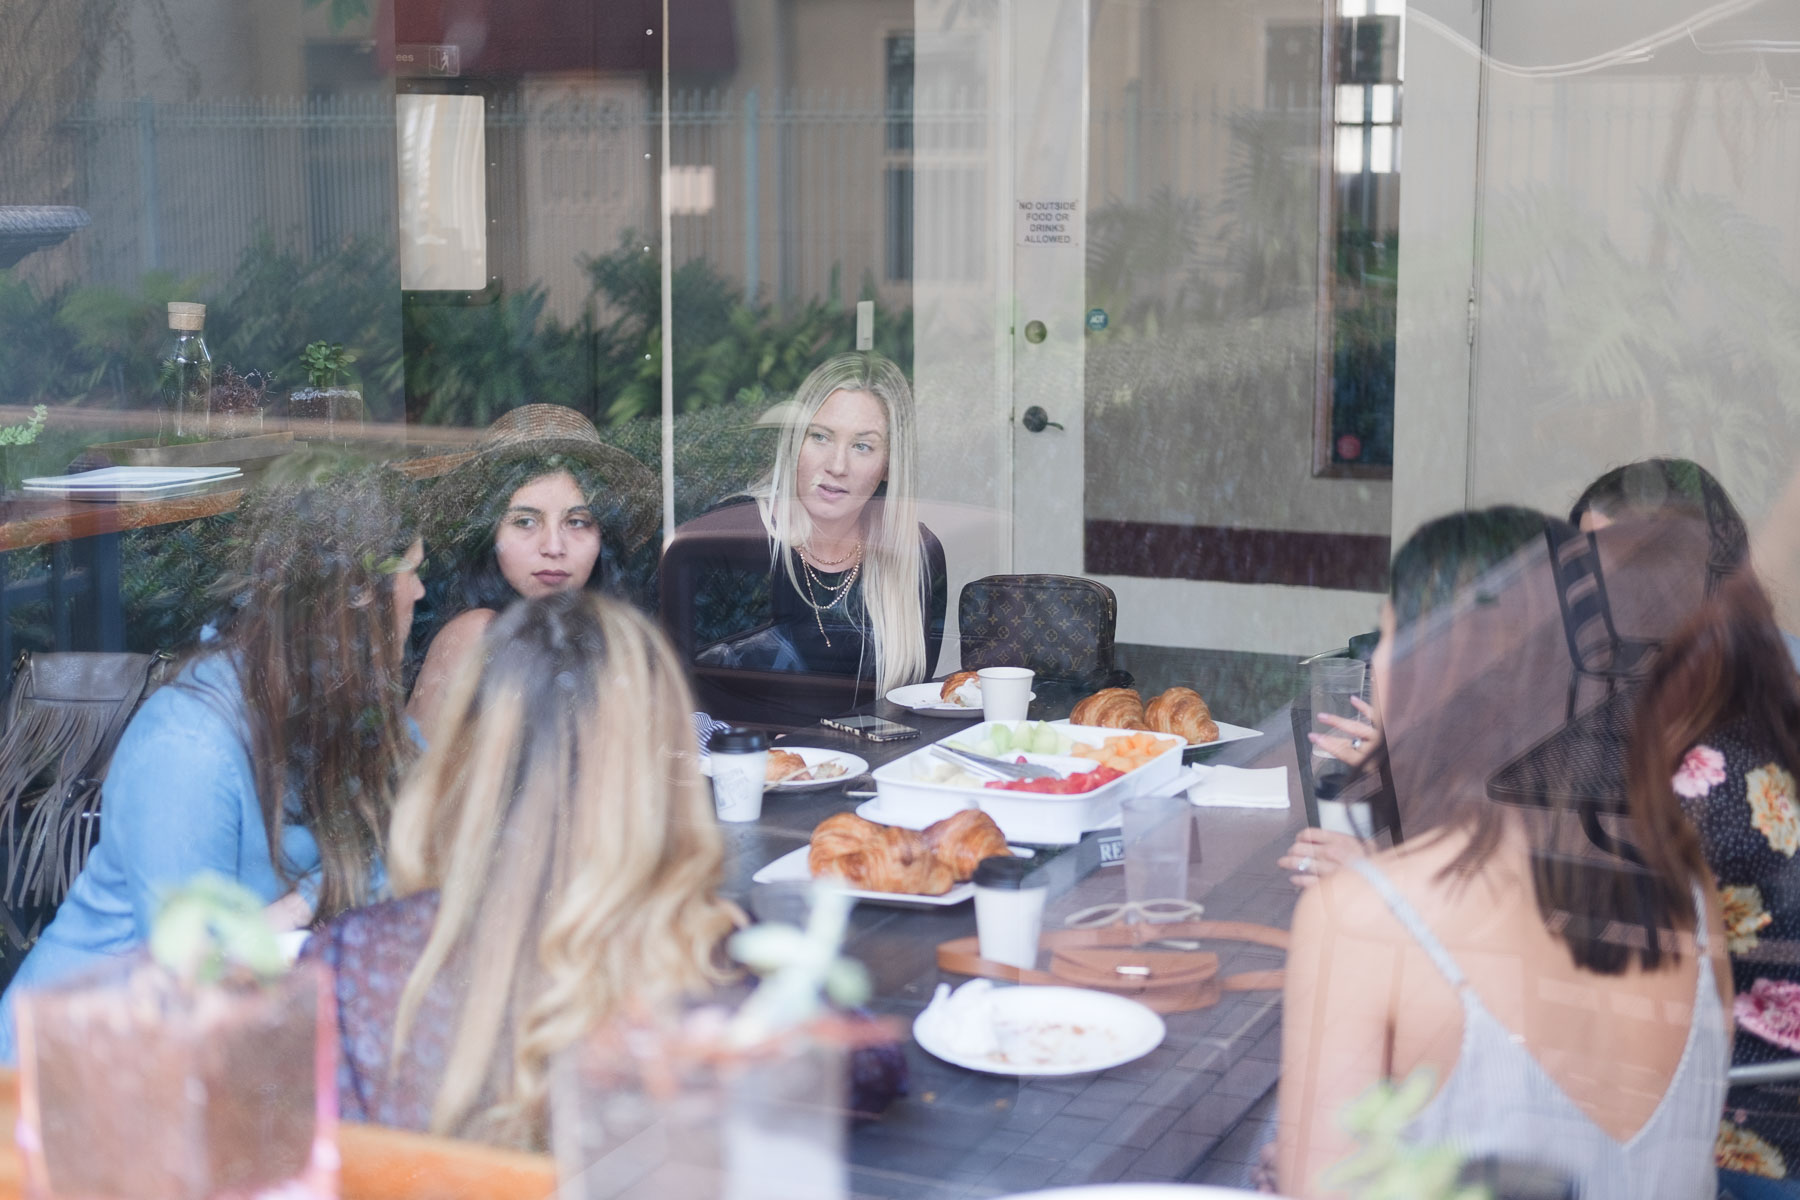 Rachel Off Duty: How to Start Networking - Cuppa Cuppa Long Beach